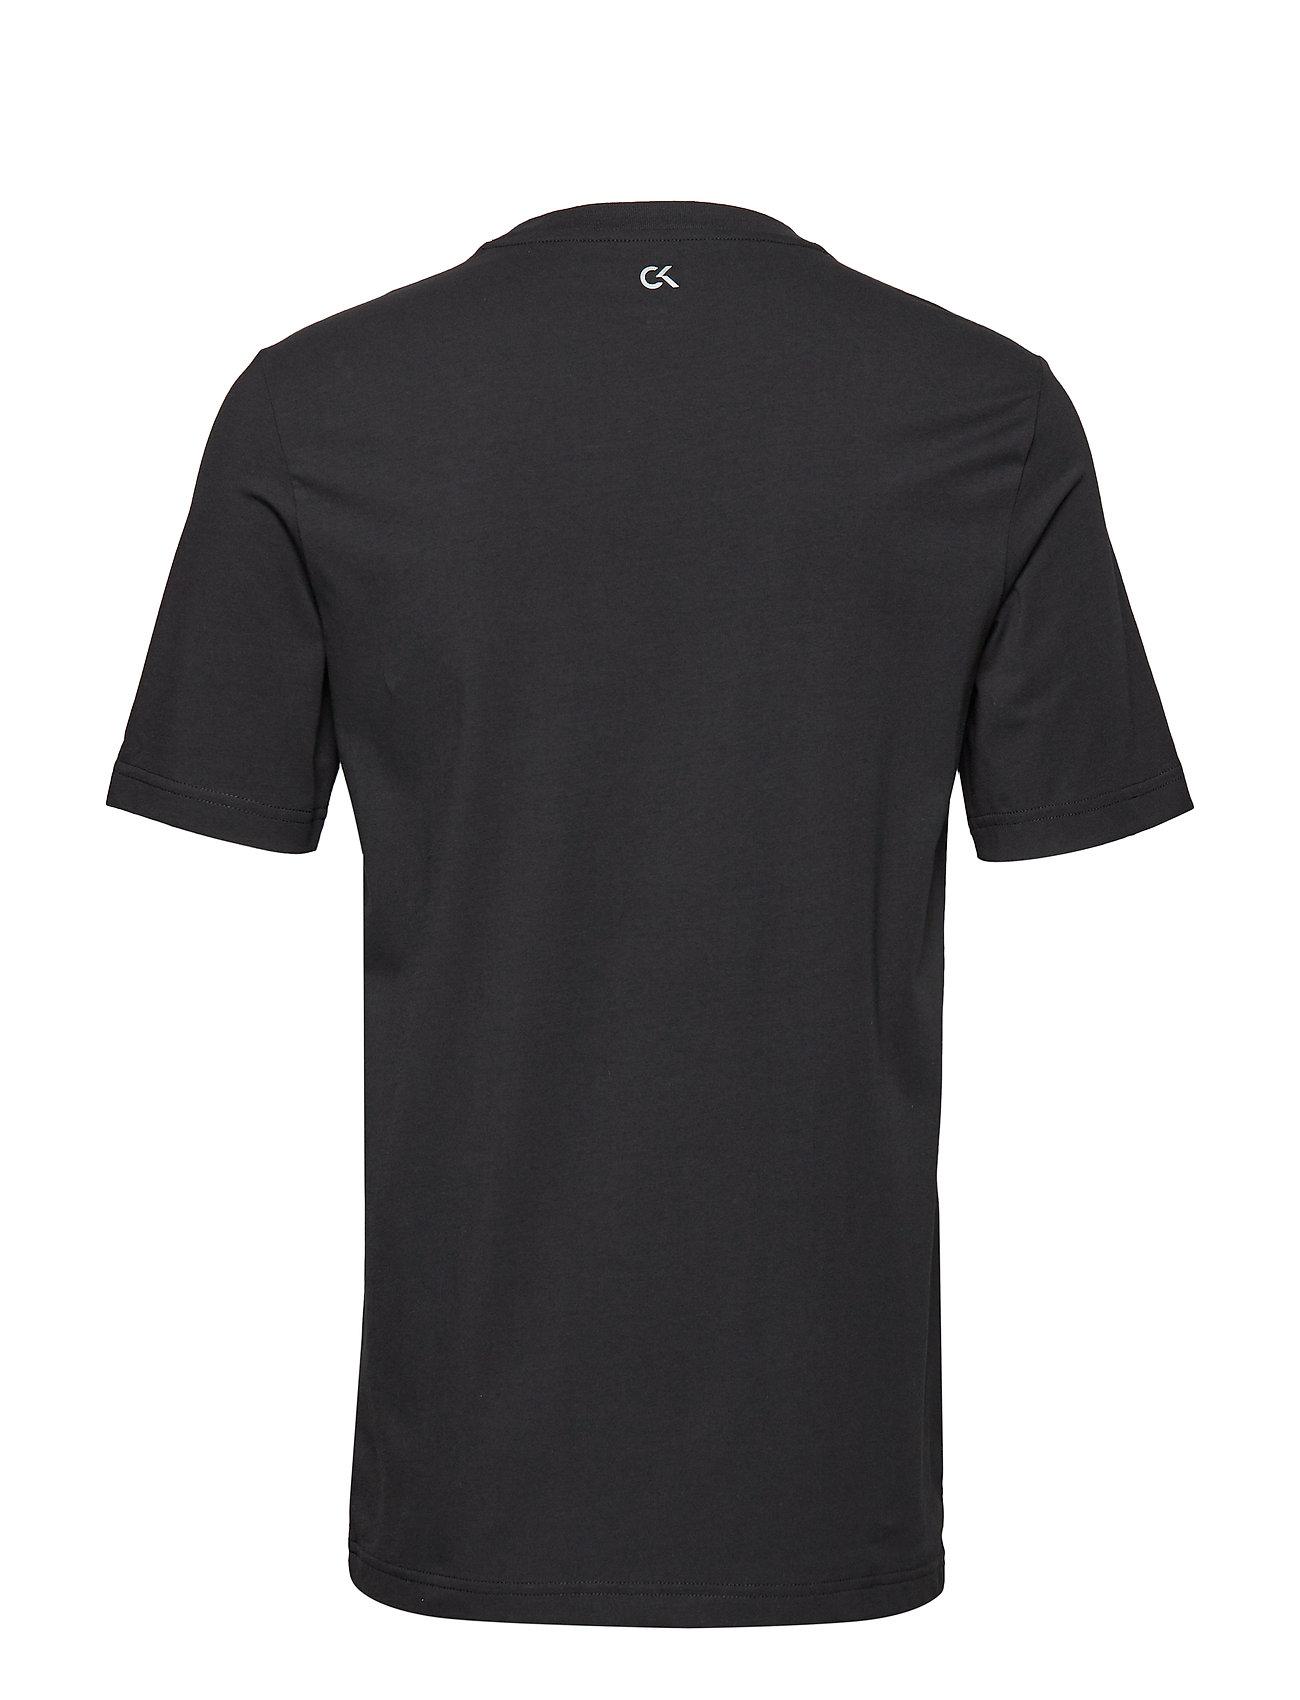 Teeck Black Logo bright Klein Performance Ss WhiteCalvin rBWCdxoe